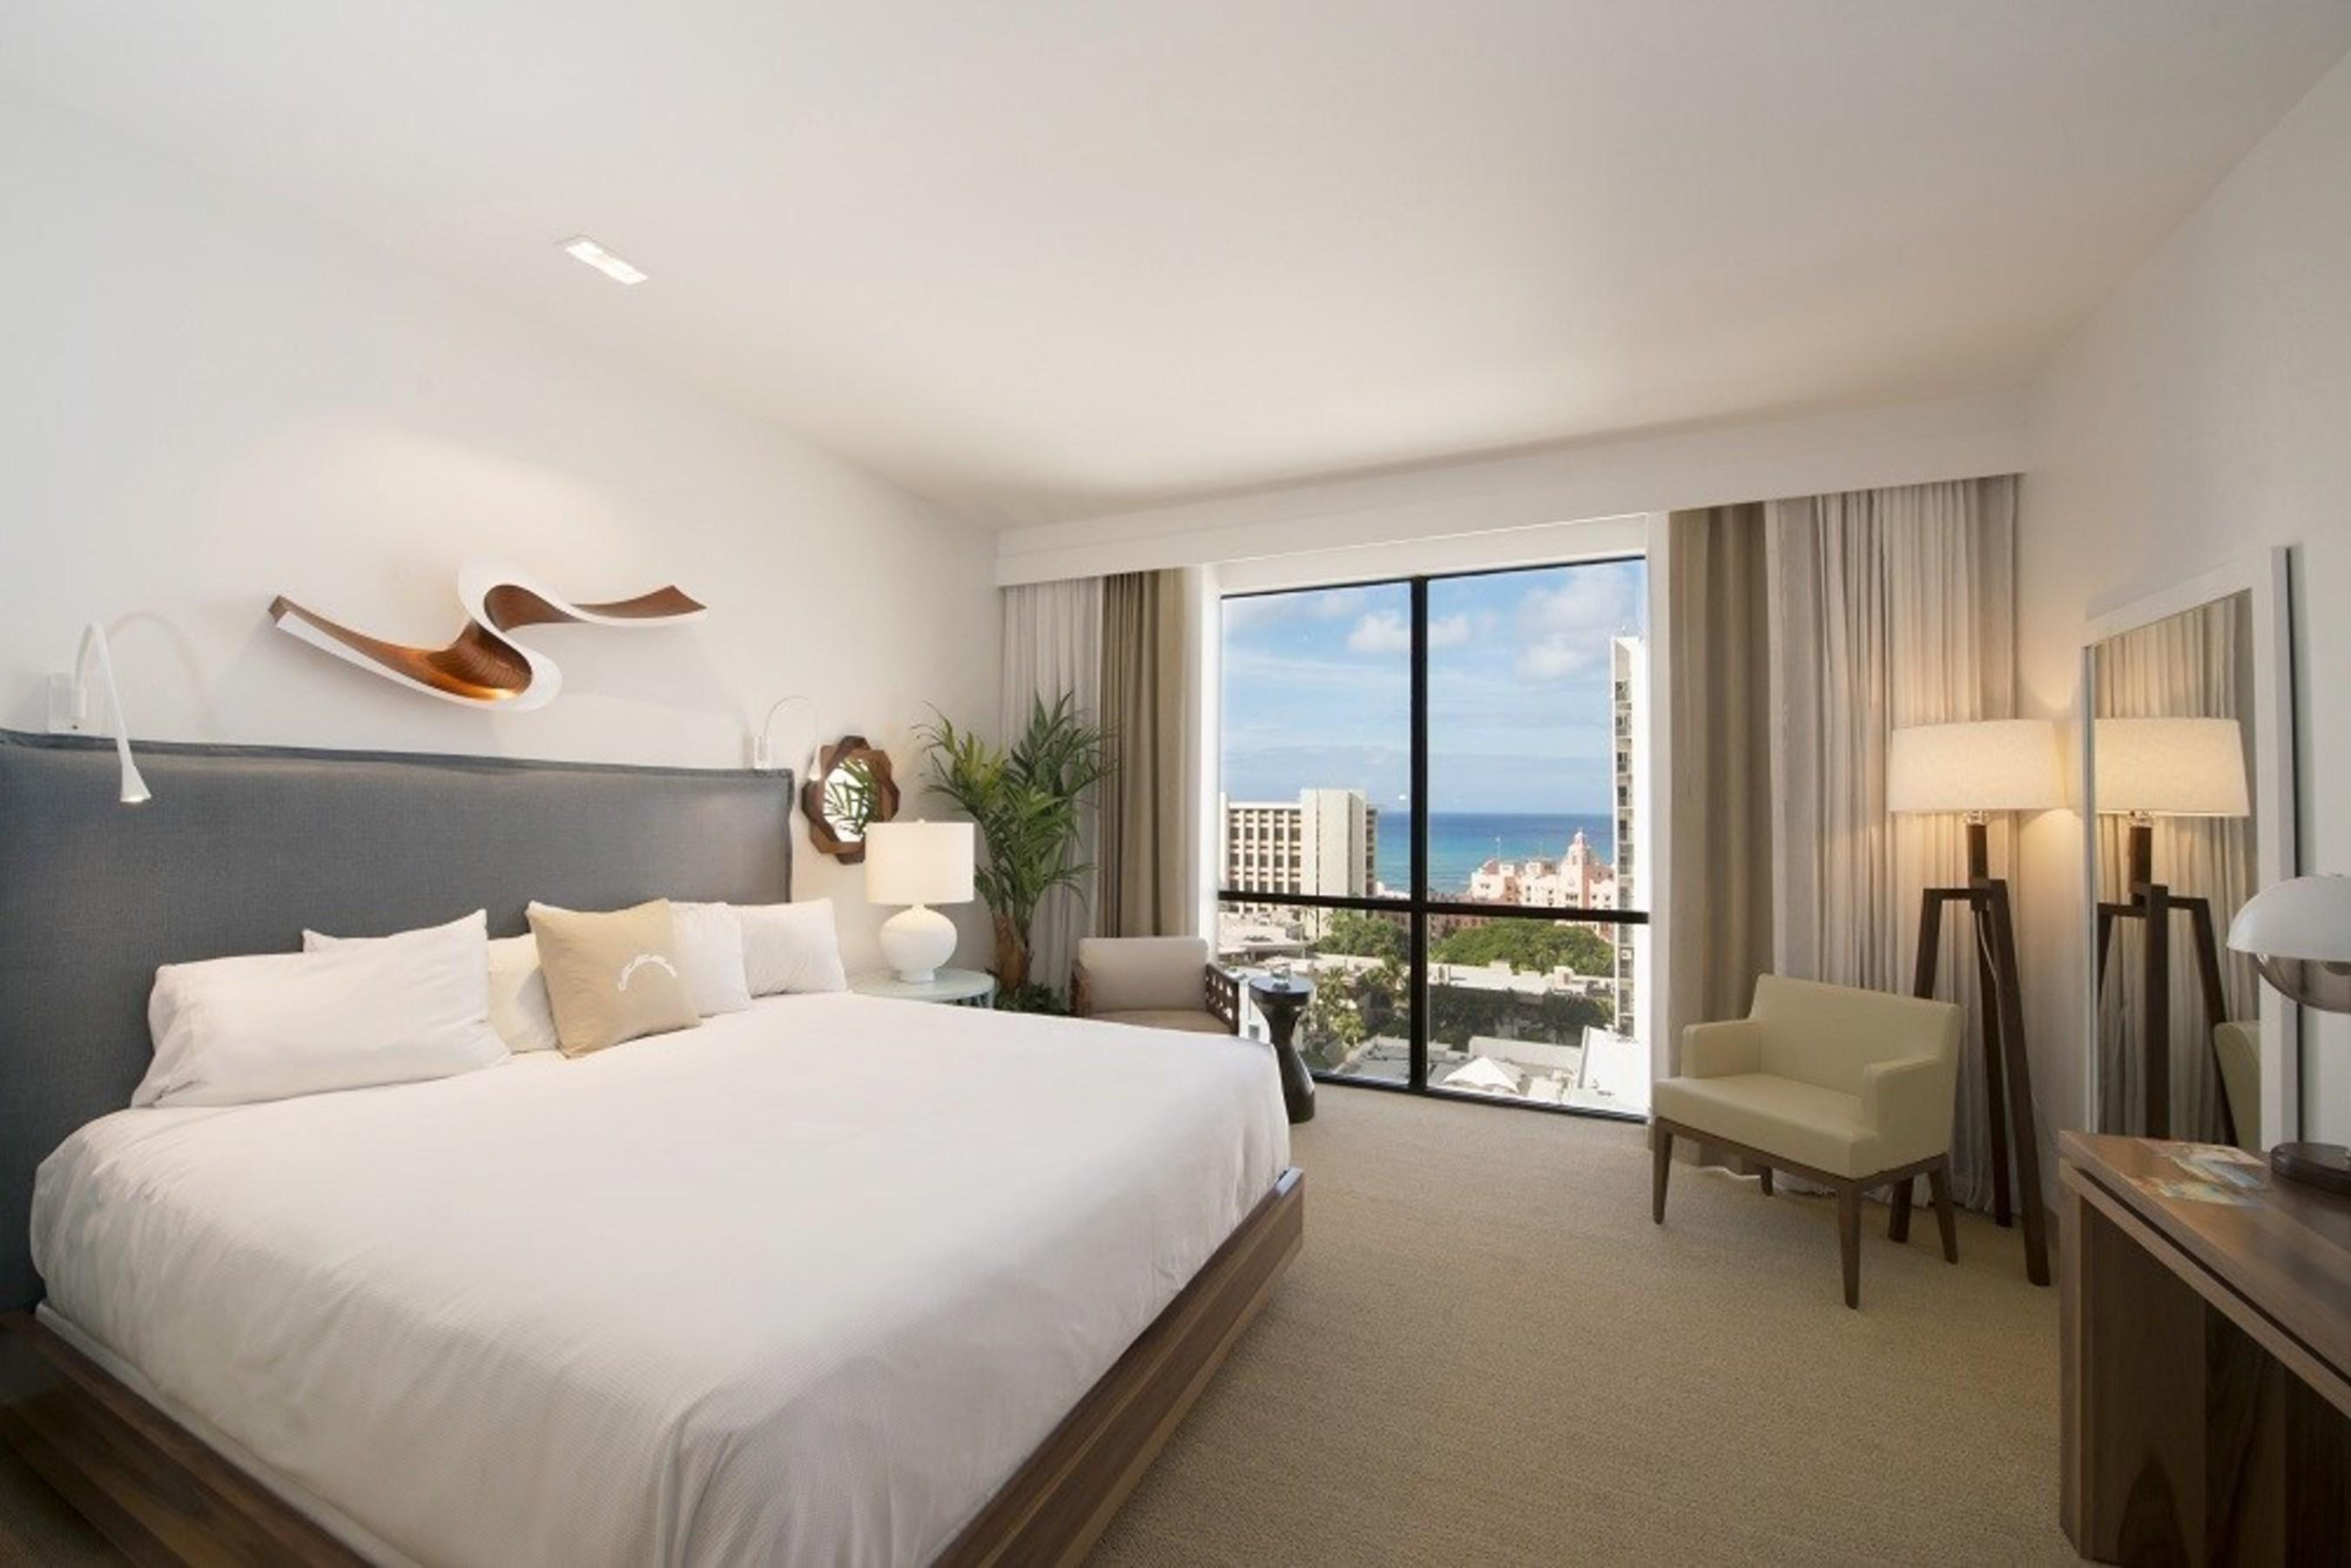 Hyatt Centric Waikīkī Beach room rendering